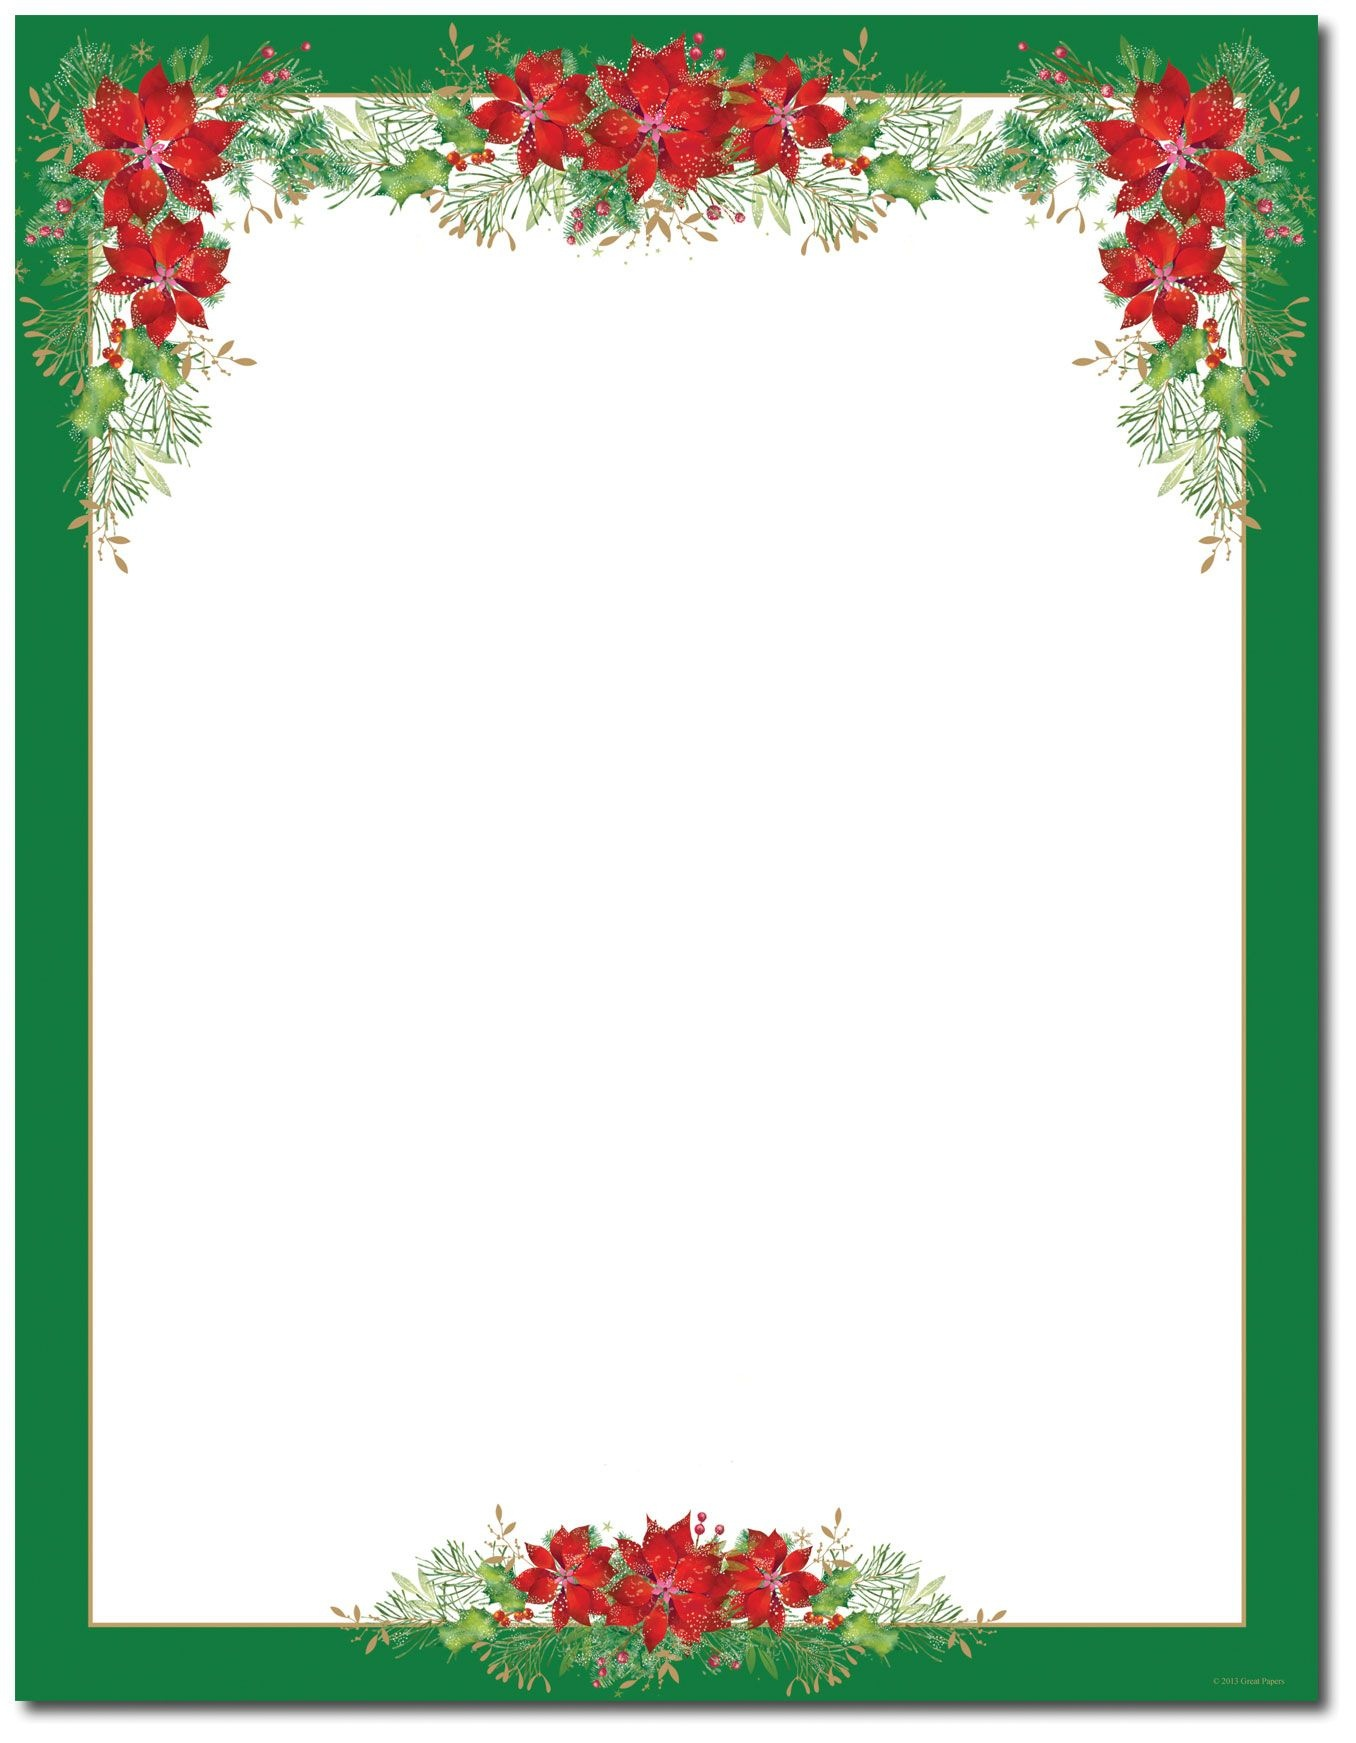 Poinsettia Valance Letterhead | Holiday Papers | Christmas Border - Free Printable Letterhead Borders